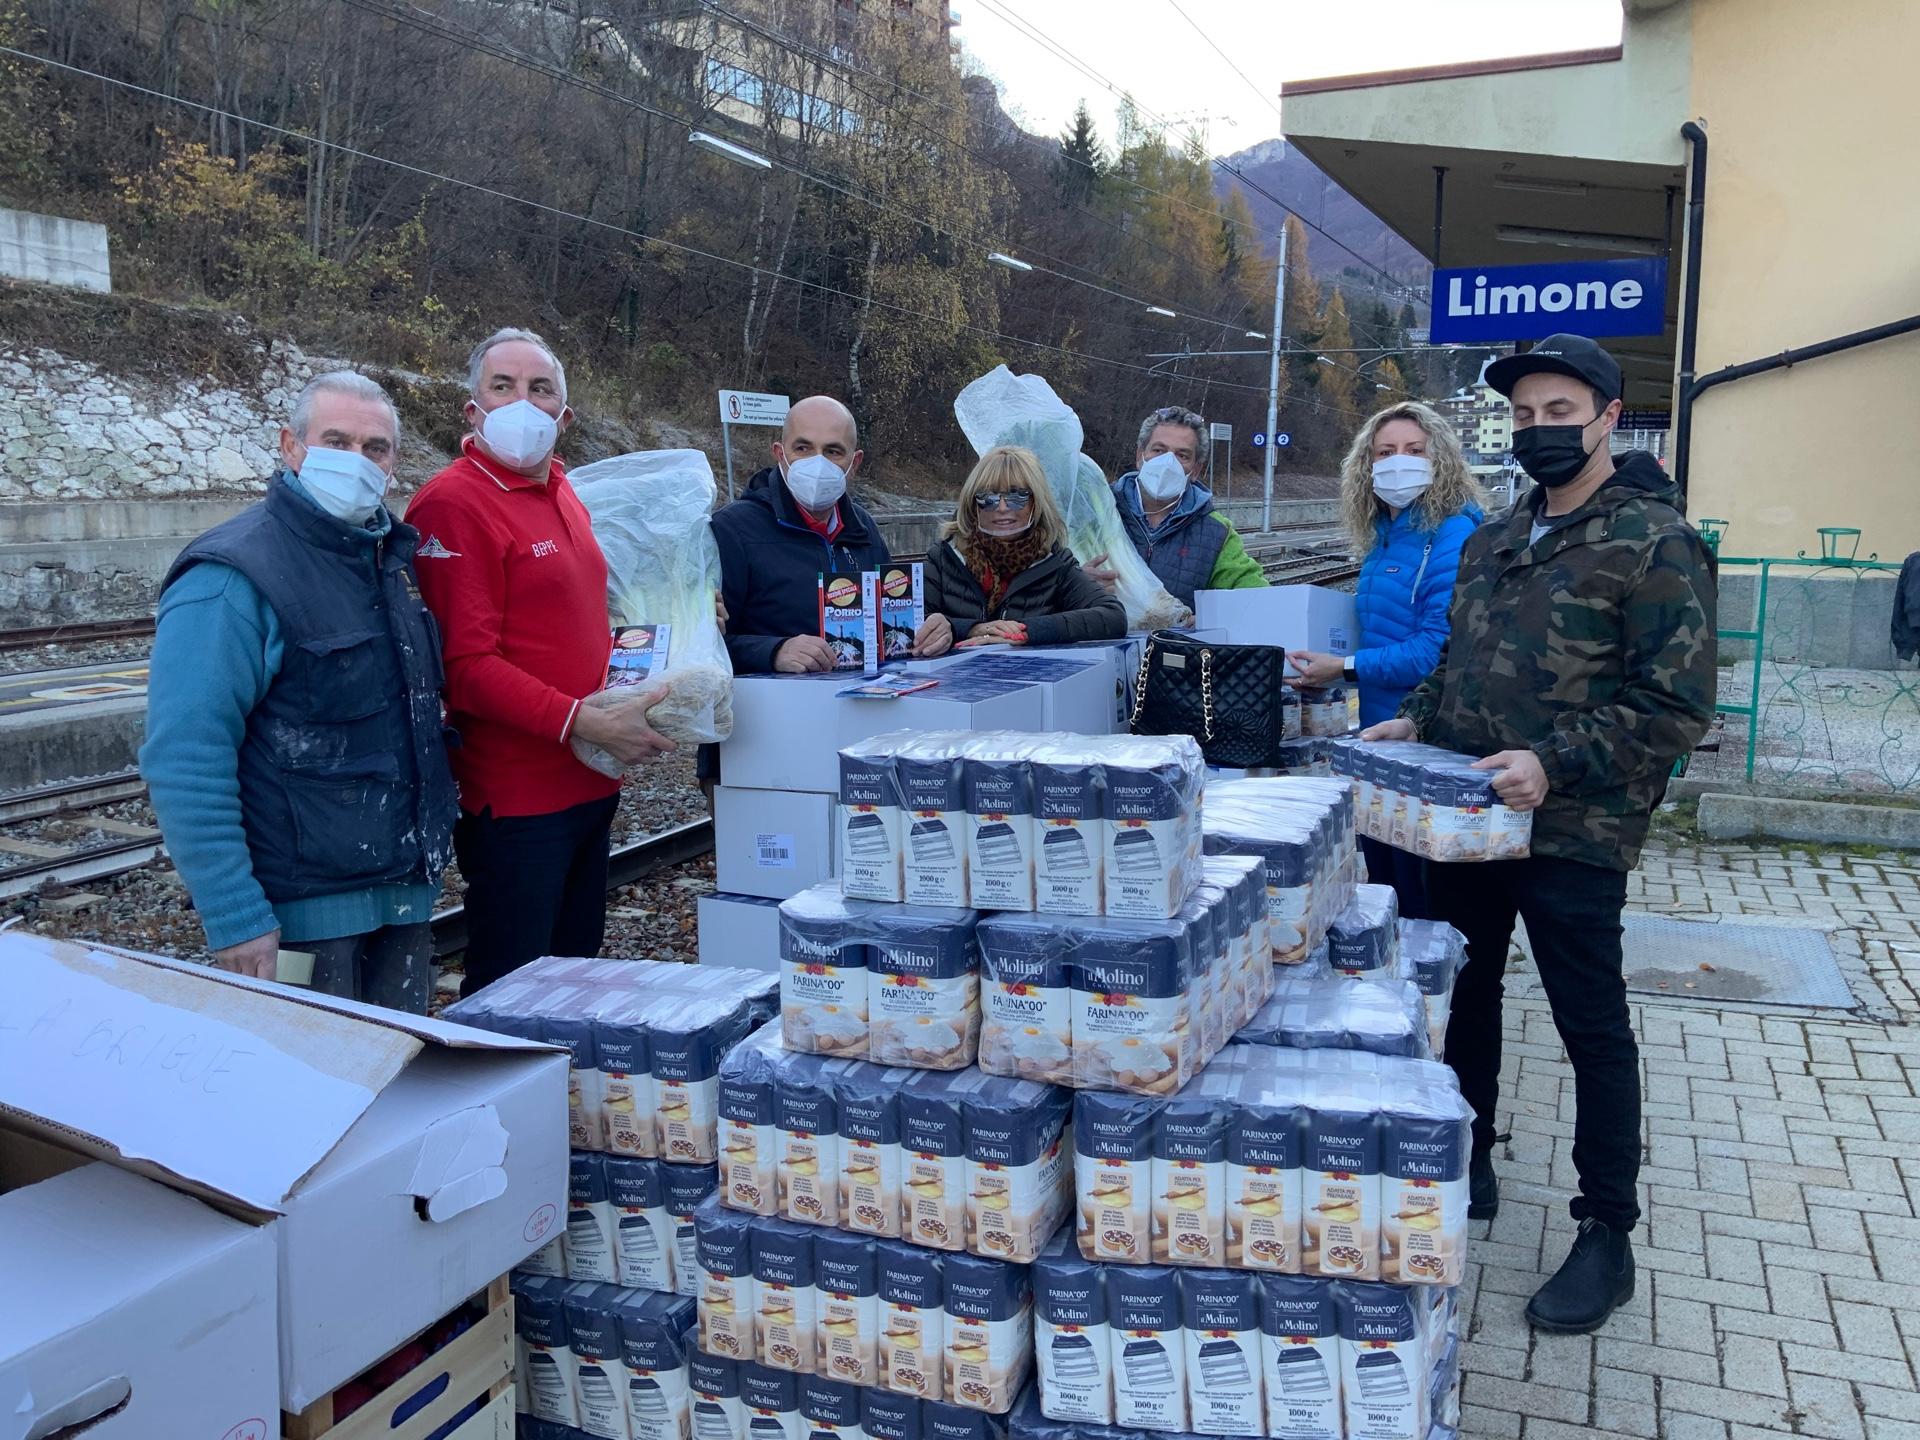 Derrate alimentari in partenza da Cuneo per la Valle Roya (5)